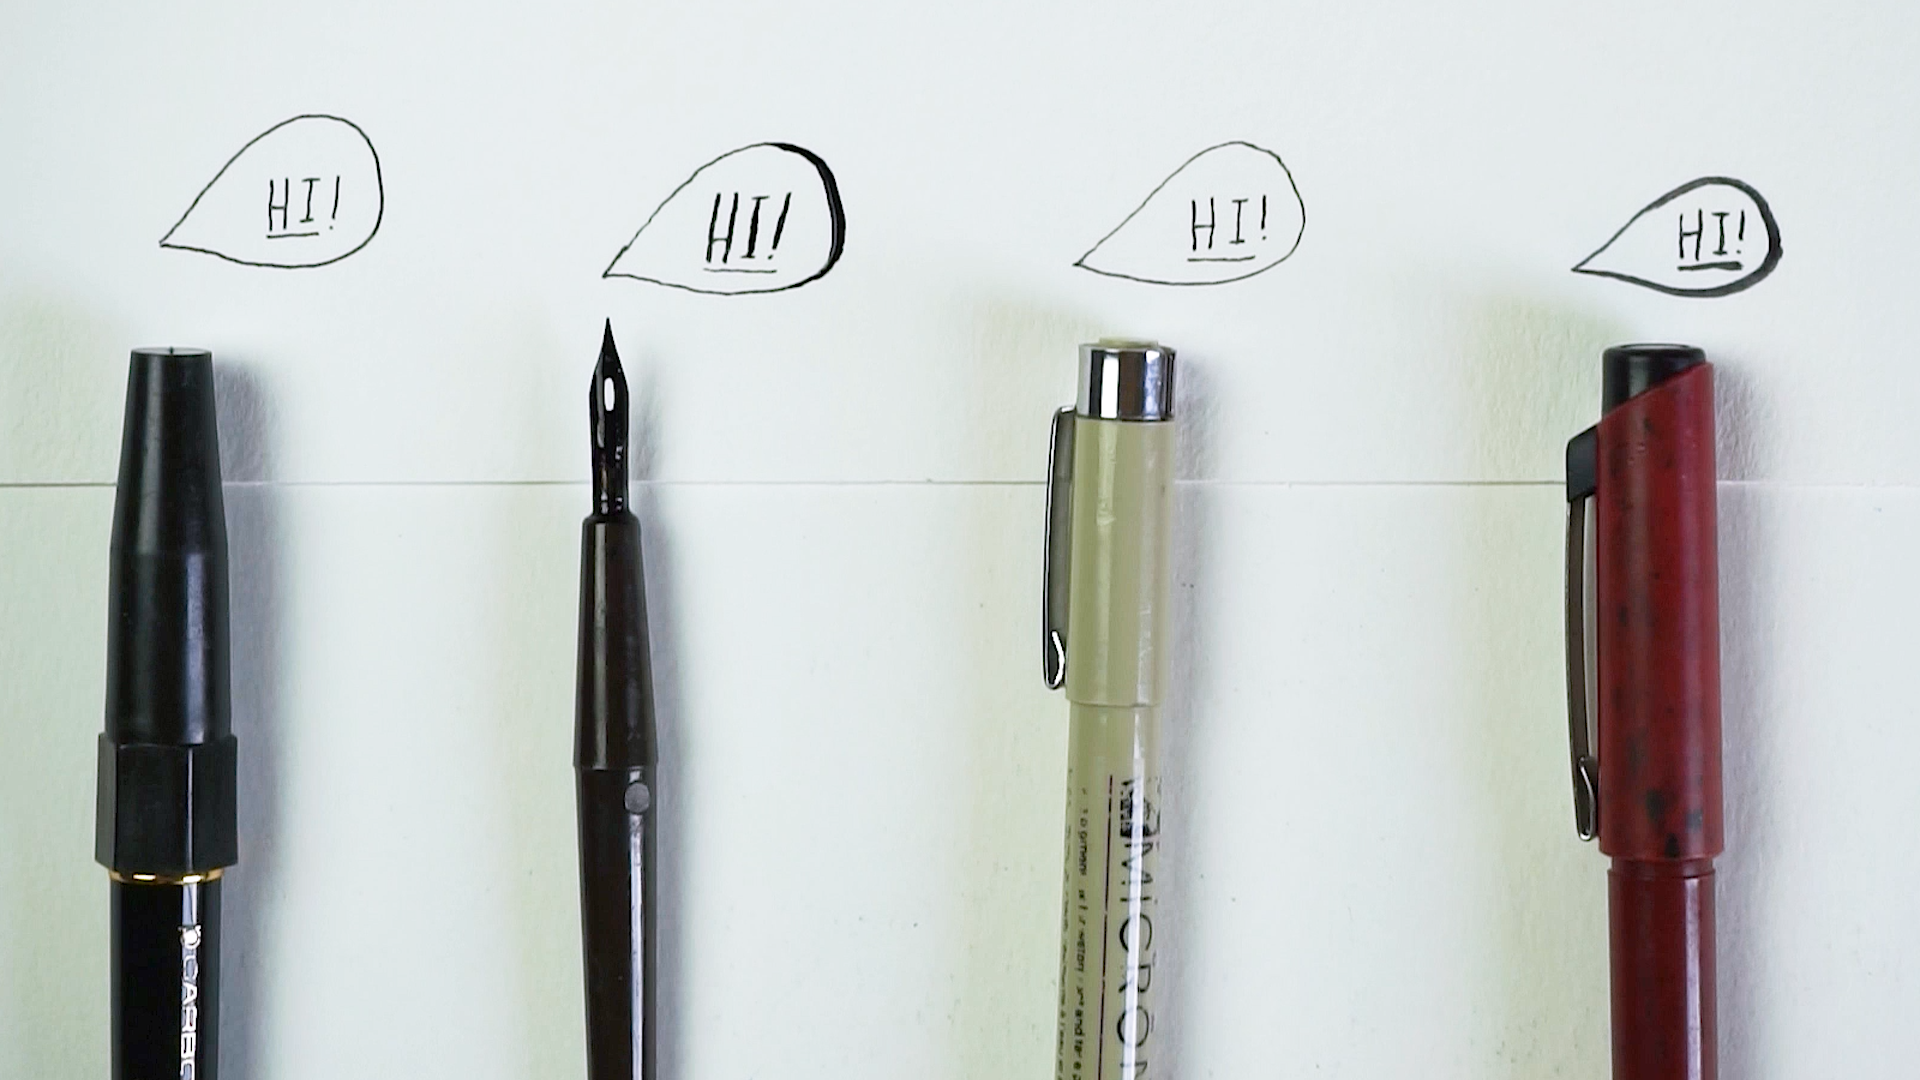 Four favorite black pens of all time - Platinum Carbon Fountain Pen (fine), Nib, Micron 01, Sakura Pocket Brush no. 14 (hard)